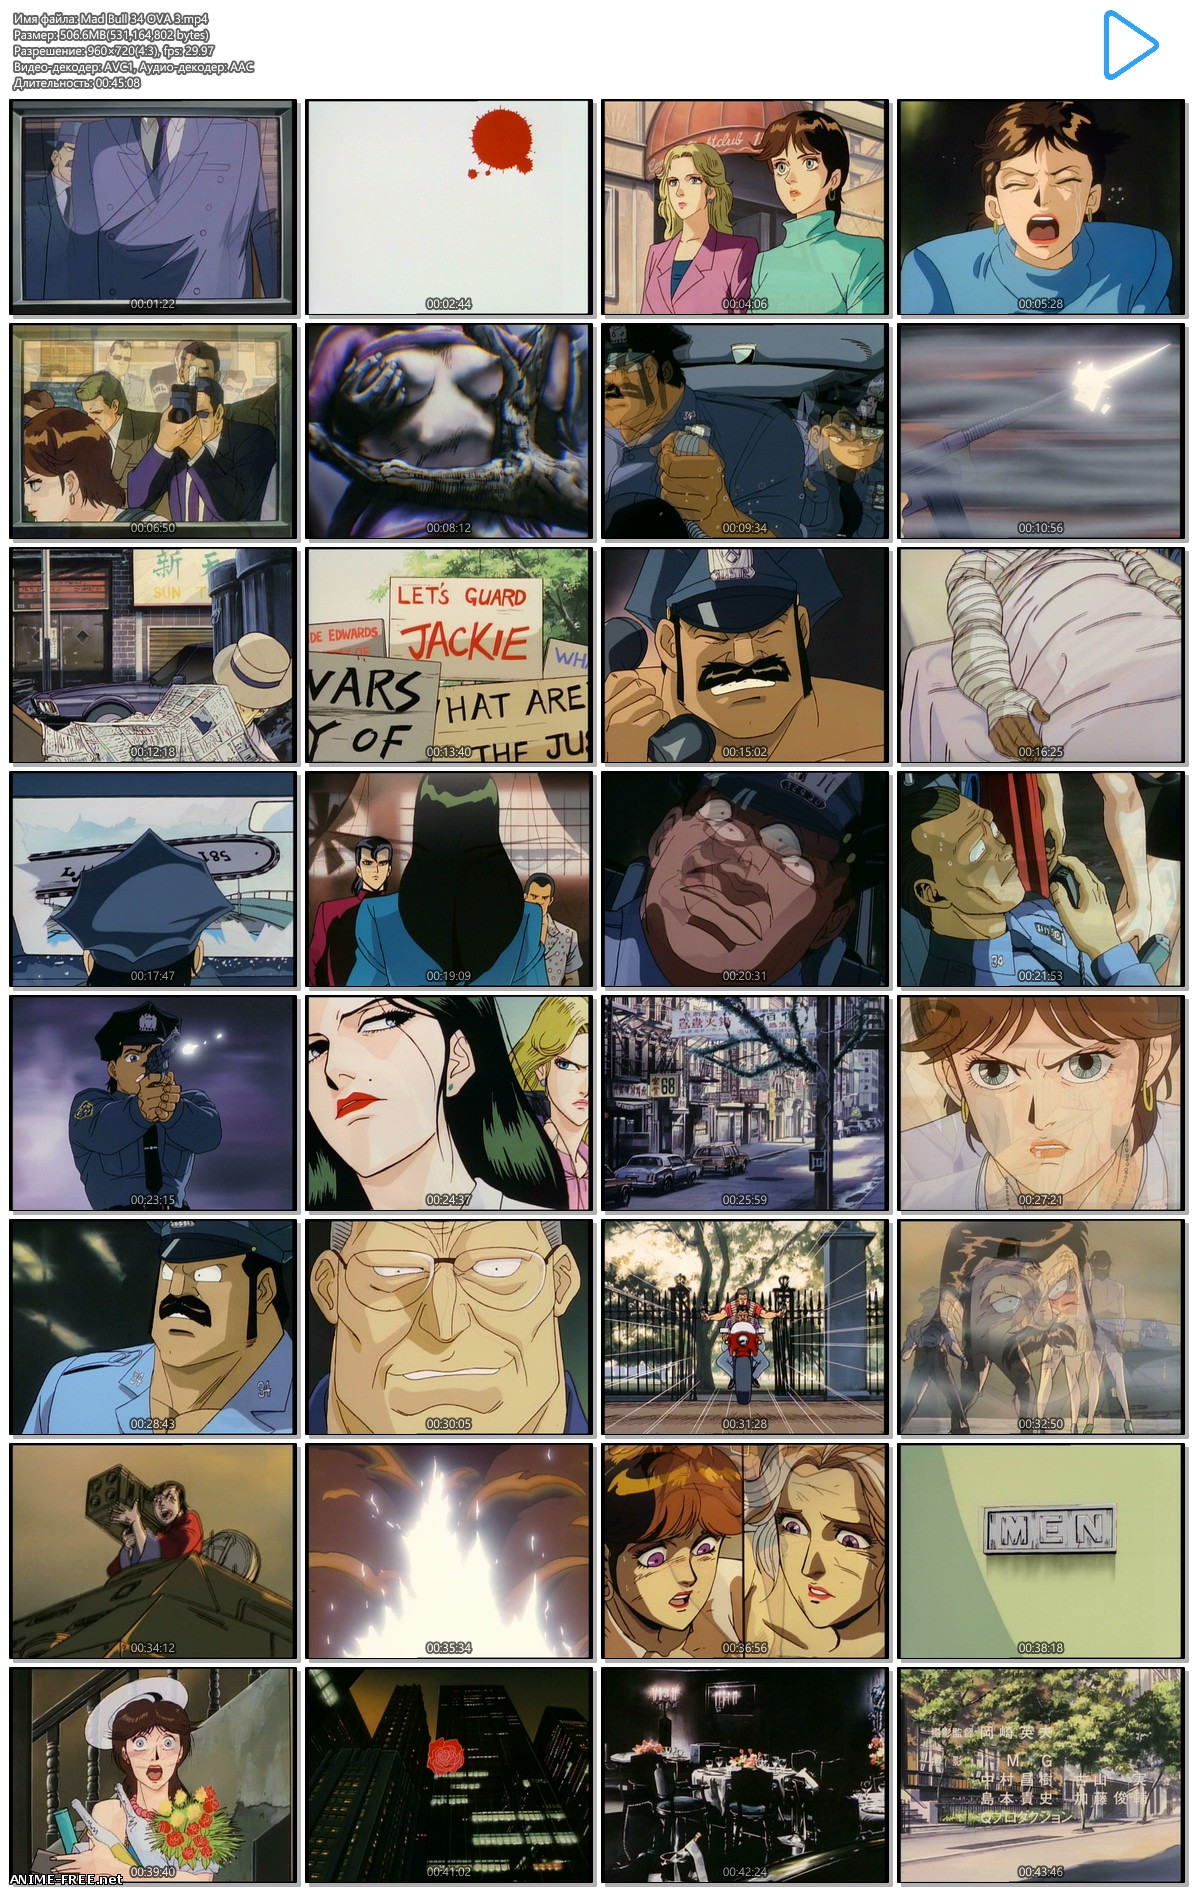 MAD★BULL 34 / Mad Bull 34 / Бешеный Бык 34 [Ep.1-4] [RUS,ENG,JAP] [720p] Anime Hentai